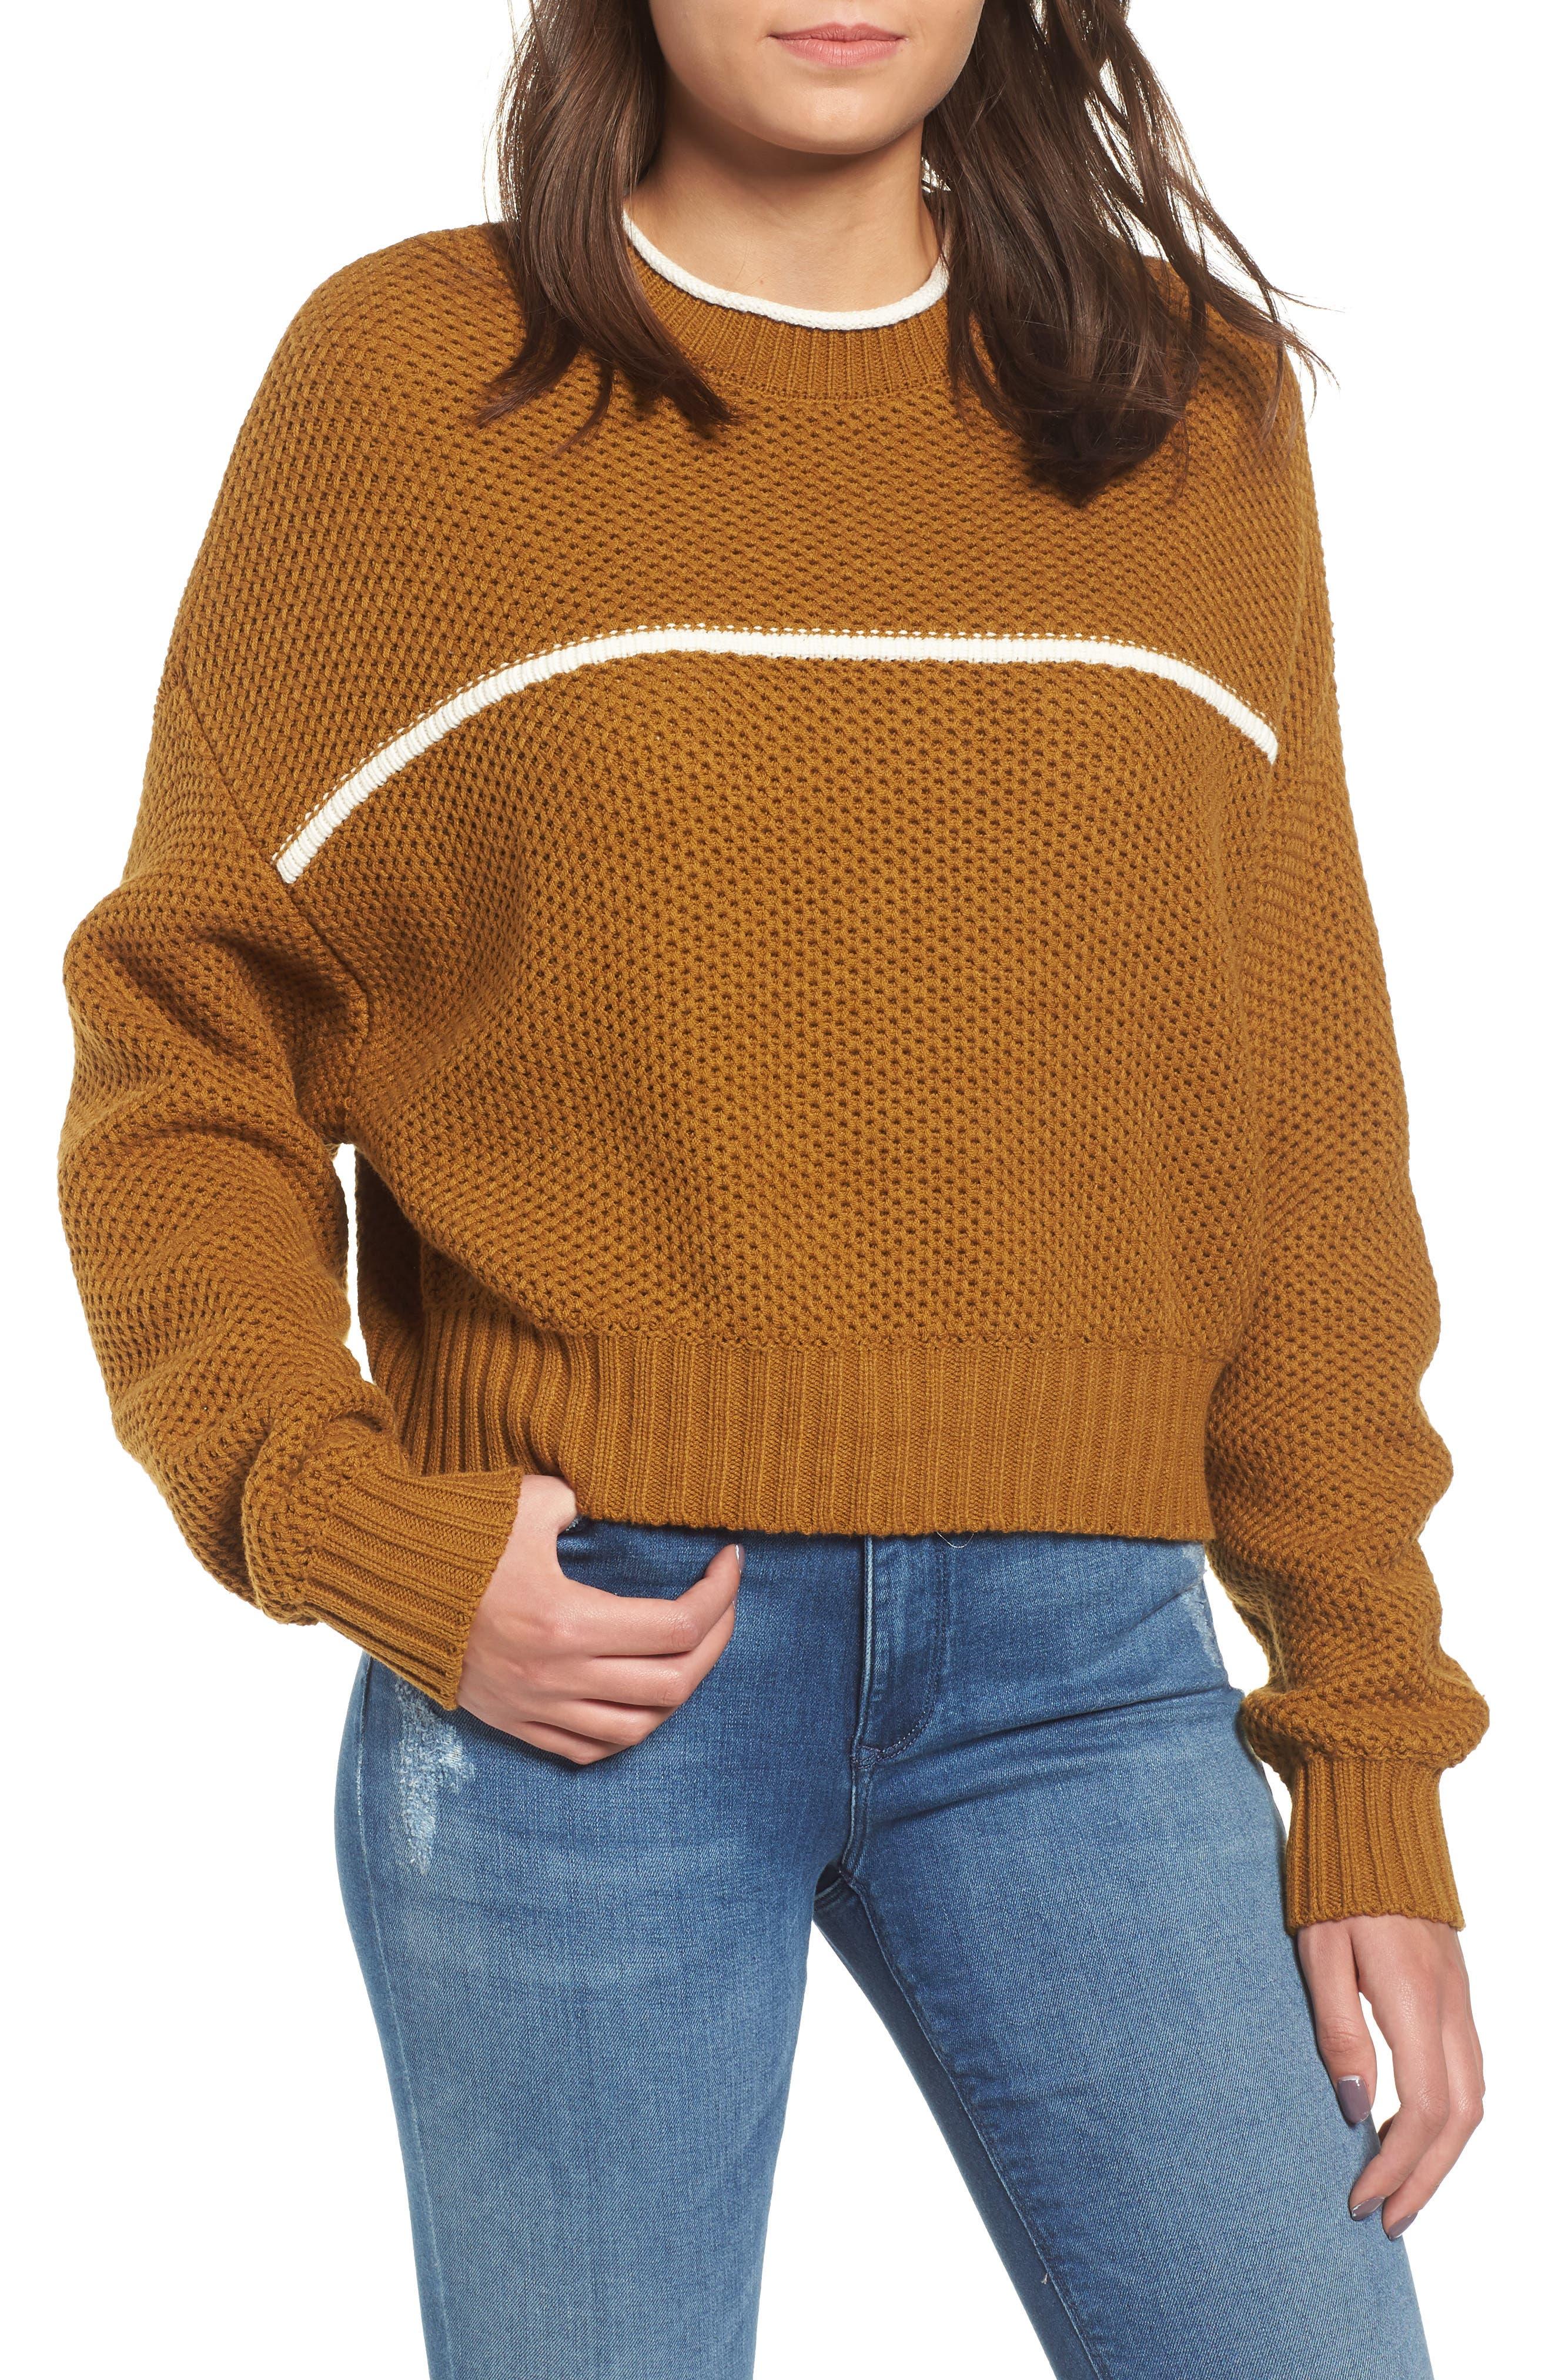 Rvca Jammer Seed Stitch Sweater, Yellow